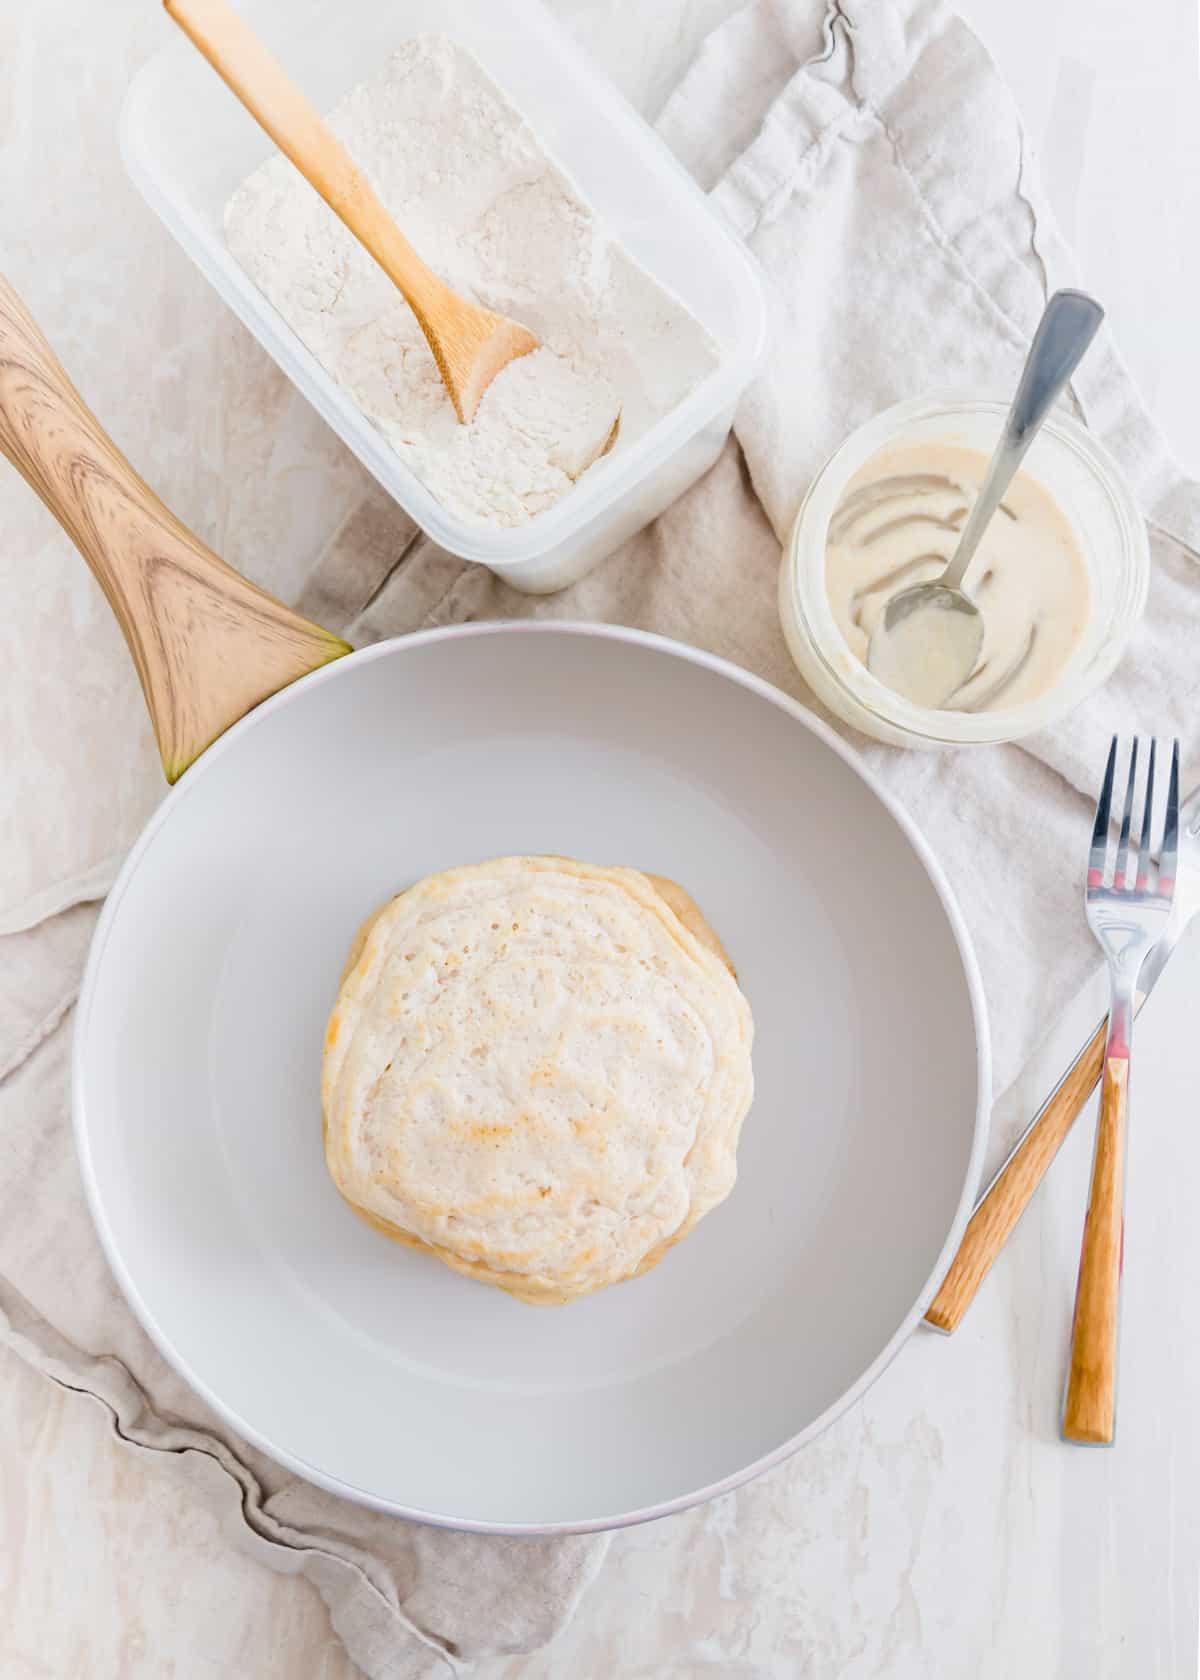 Easy sourdough pancakes made with saved sourdough discard.